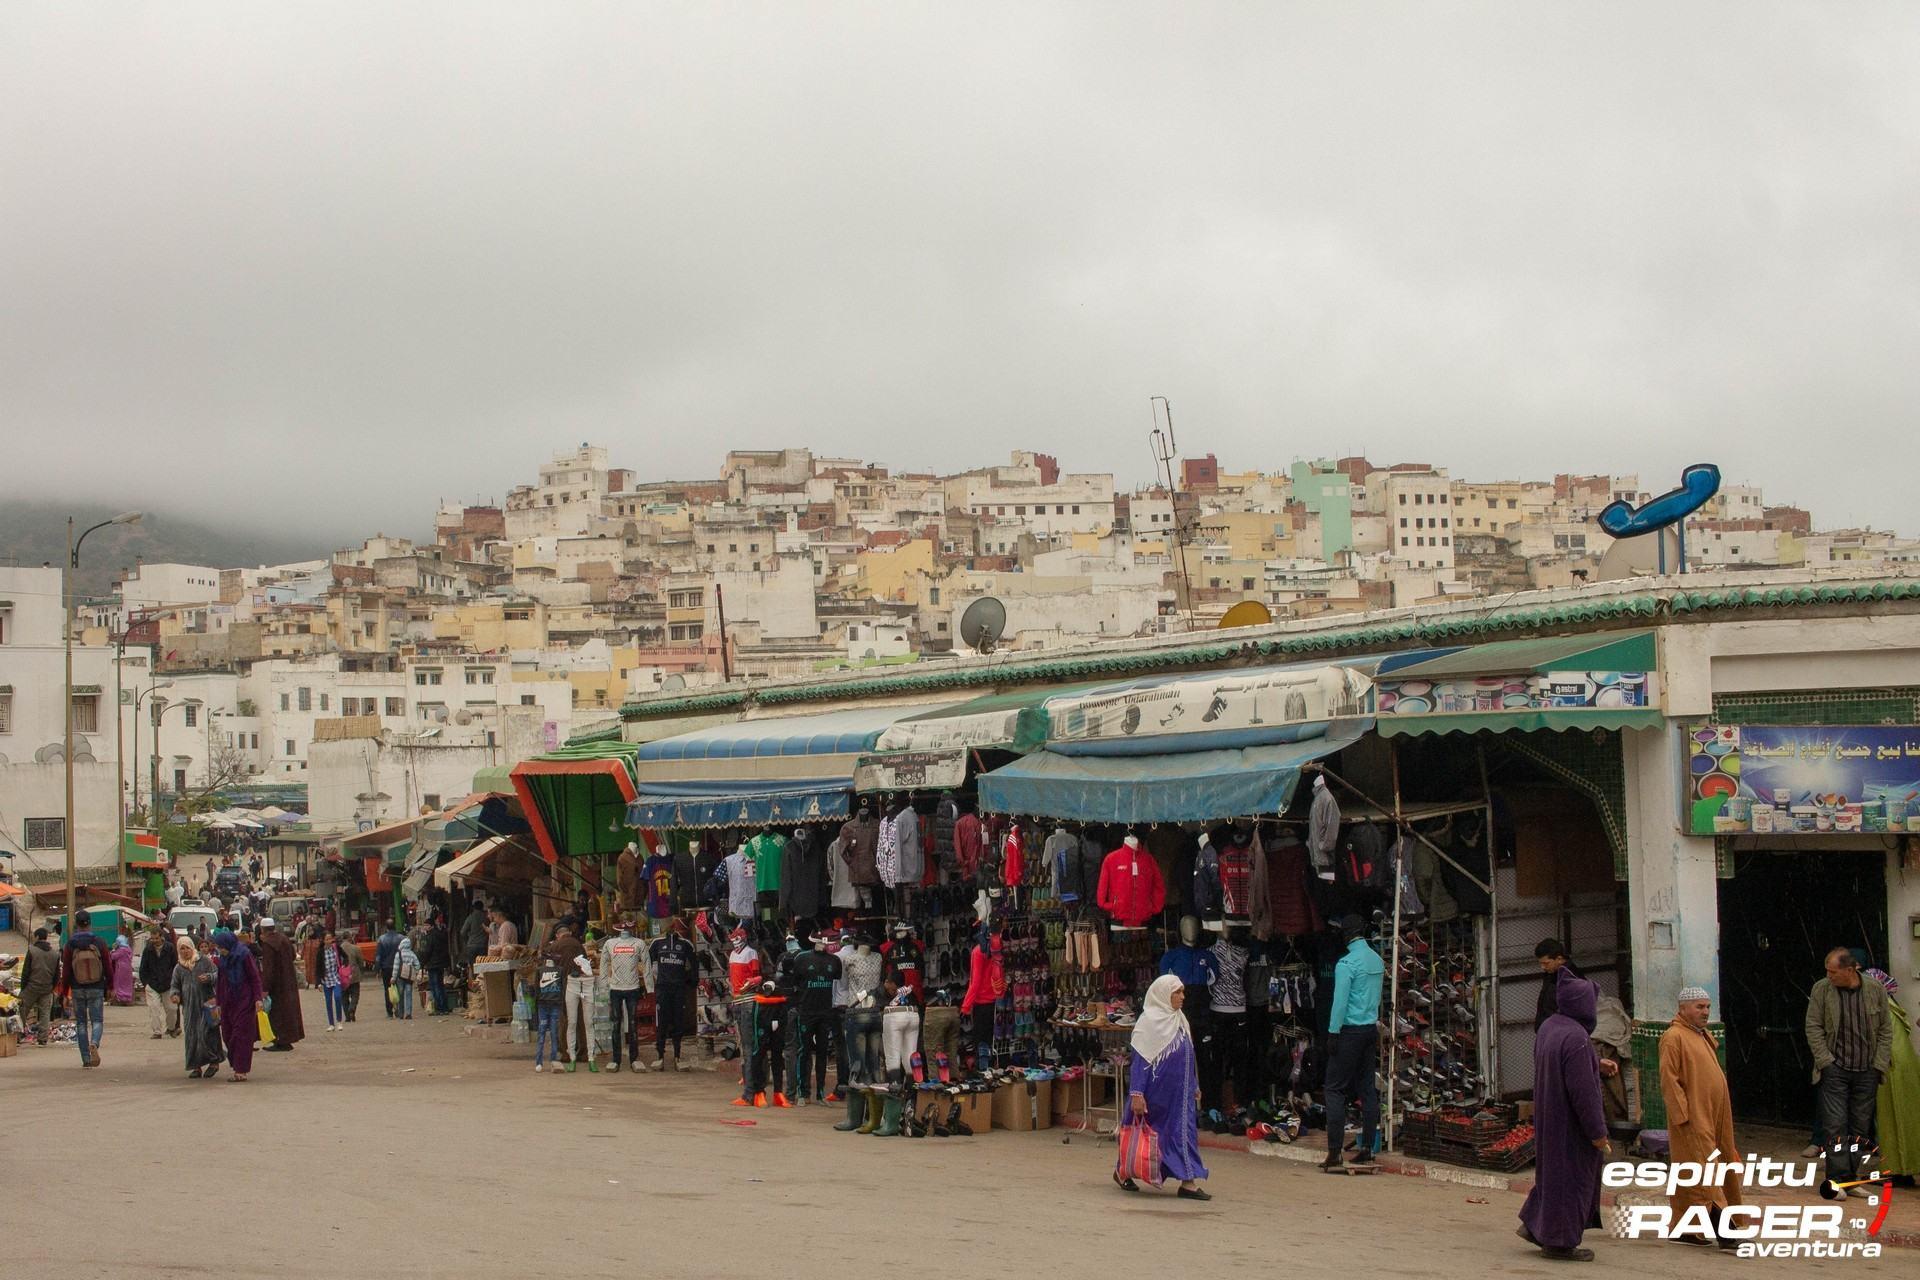 15 dias por Marruecos con Royal Enfield Himalayan 72 jpg